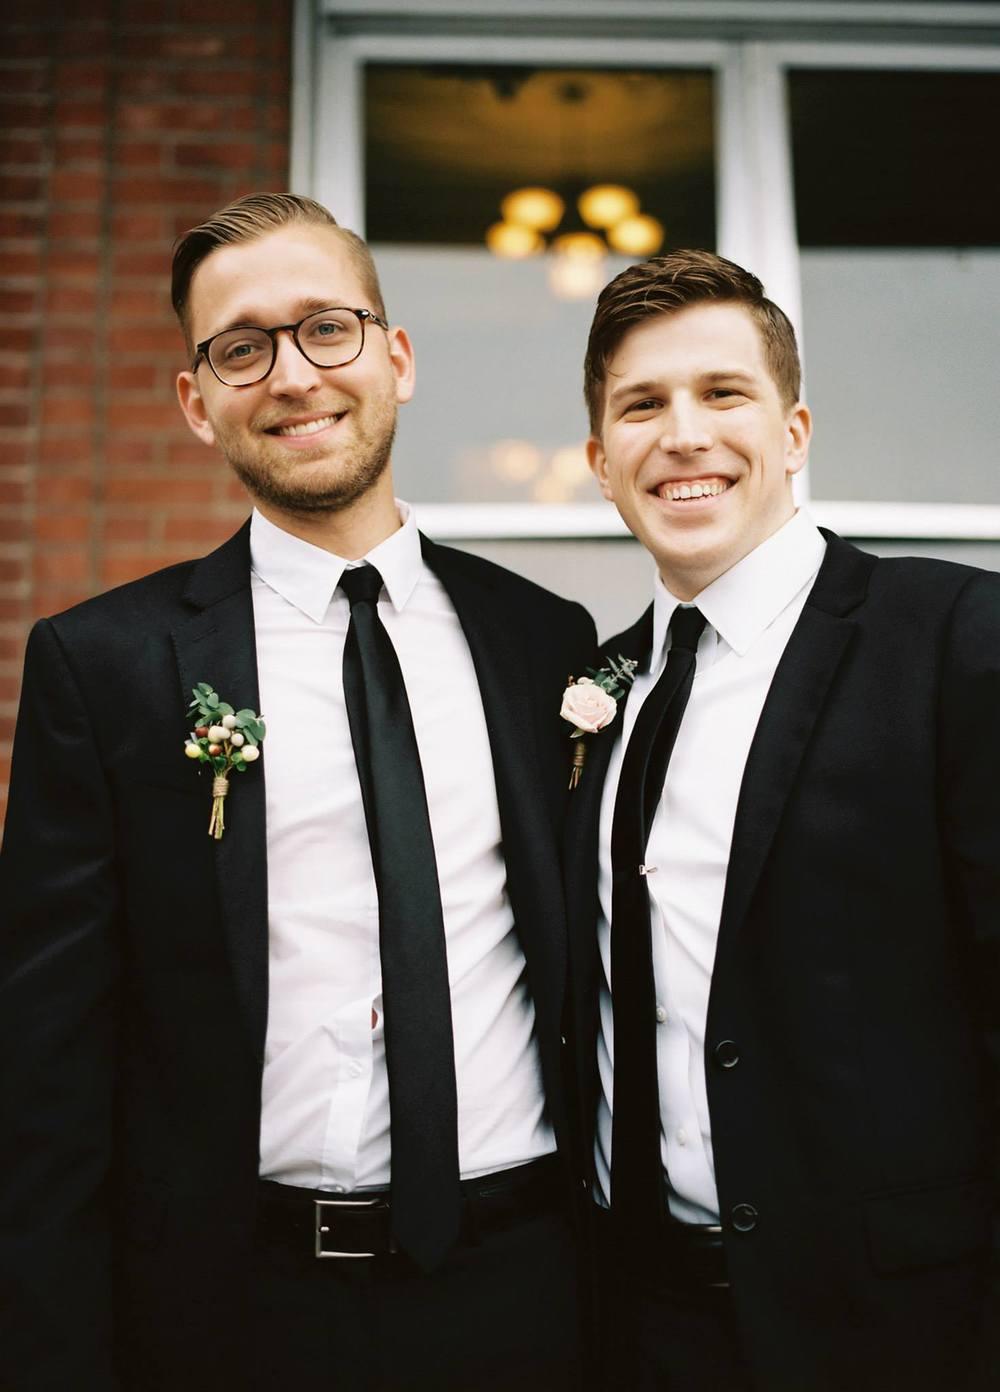 Nashville Wedding Floral Design // Groomsmen